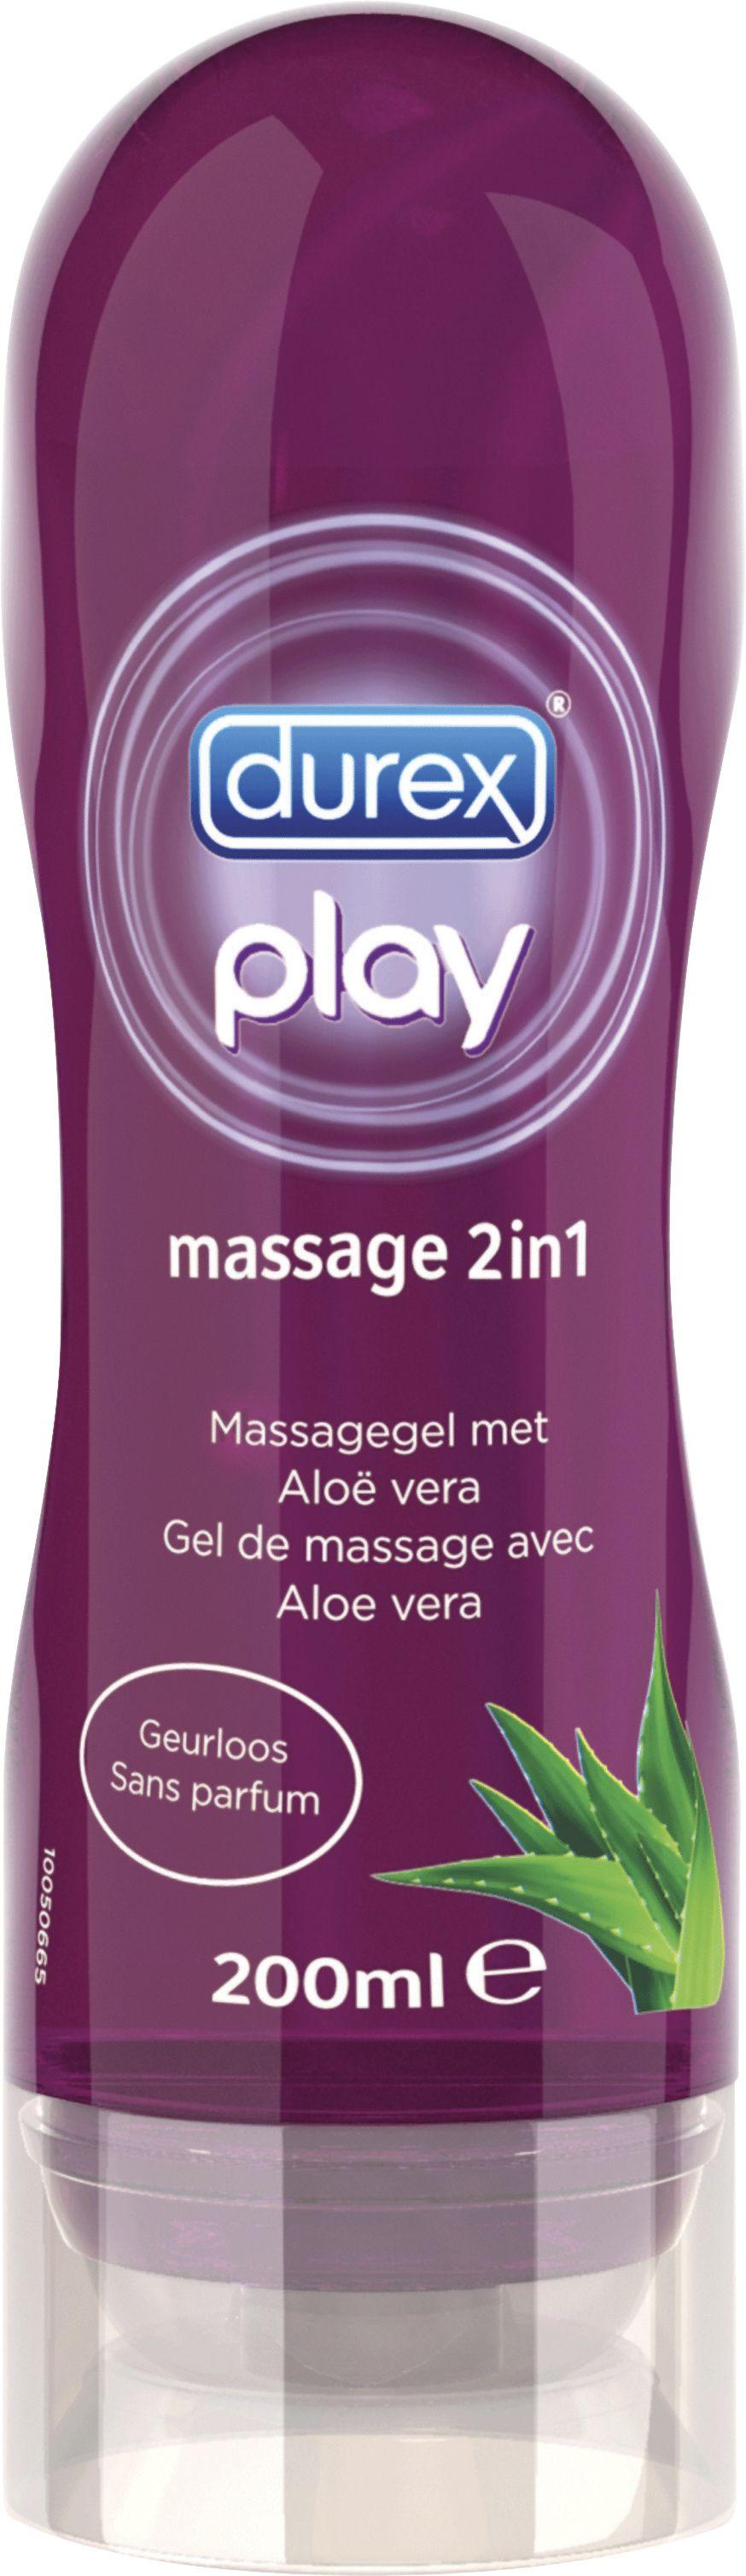 kondomer apoteket tantra massage i malmö